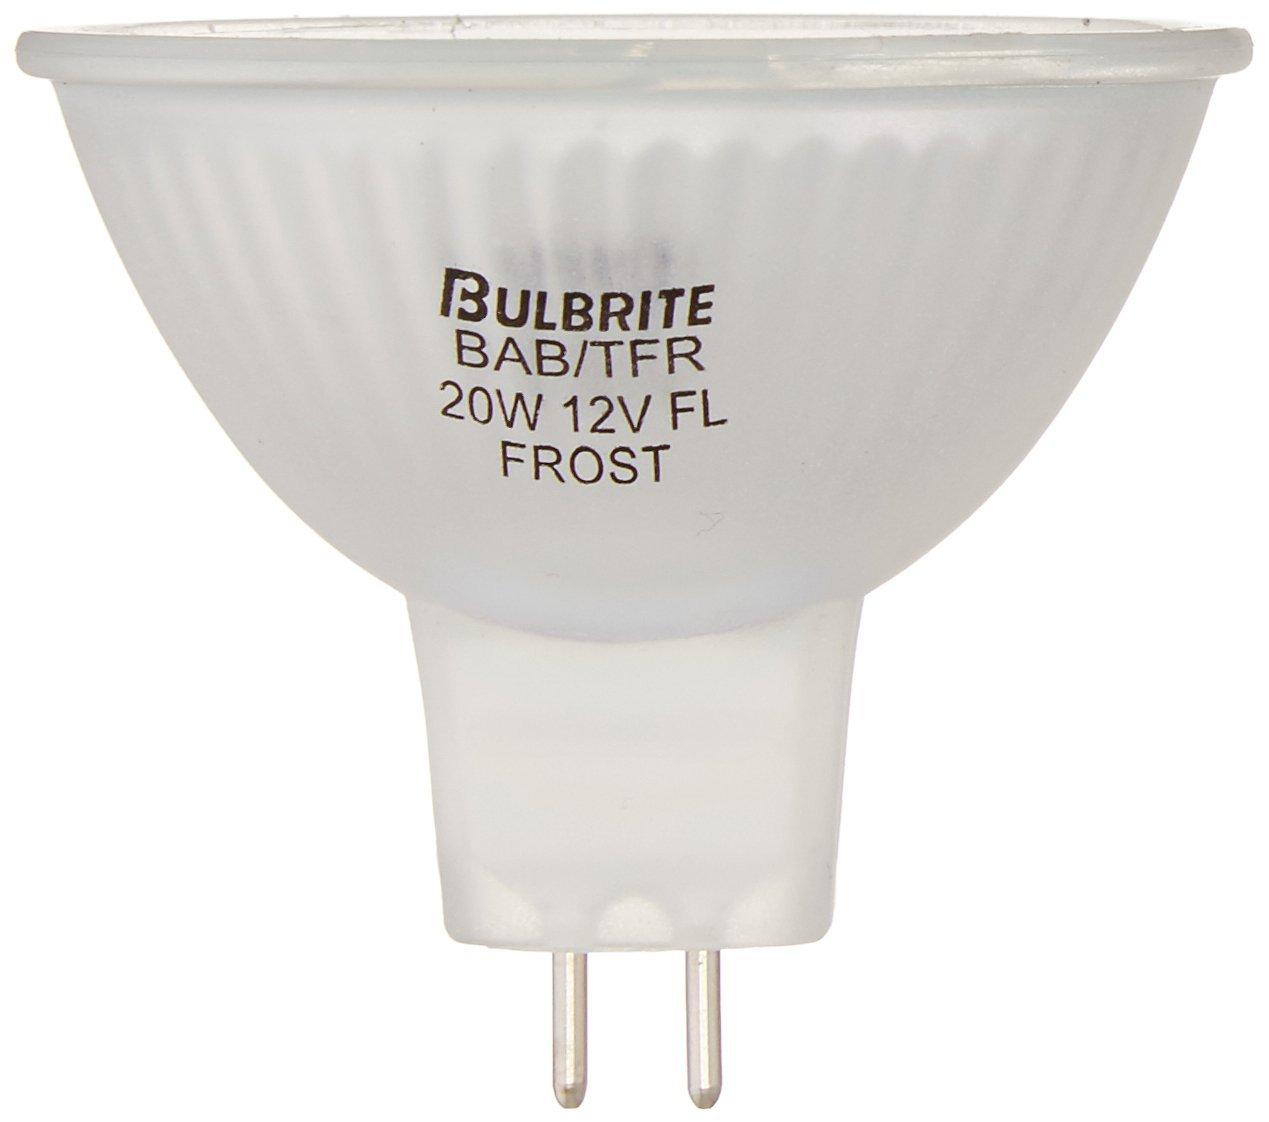 Bulbrite BAB TFR 20 Watt 12 Volt Halogen MR16 Total Frost Bi Pin Flood